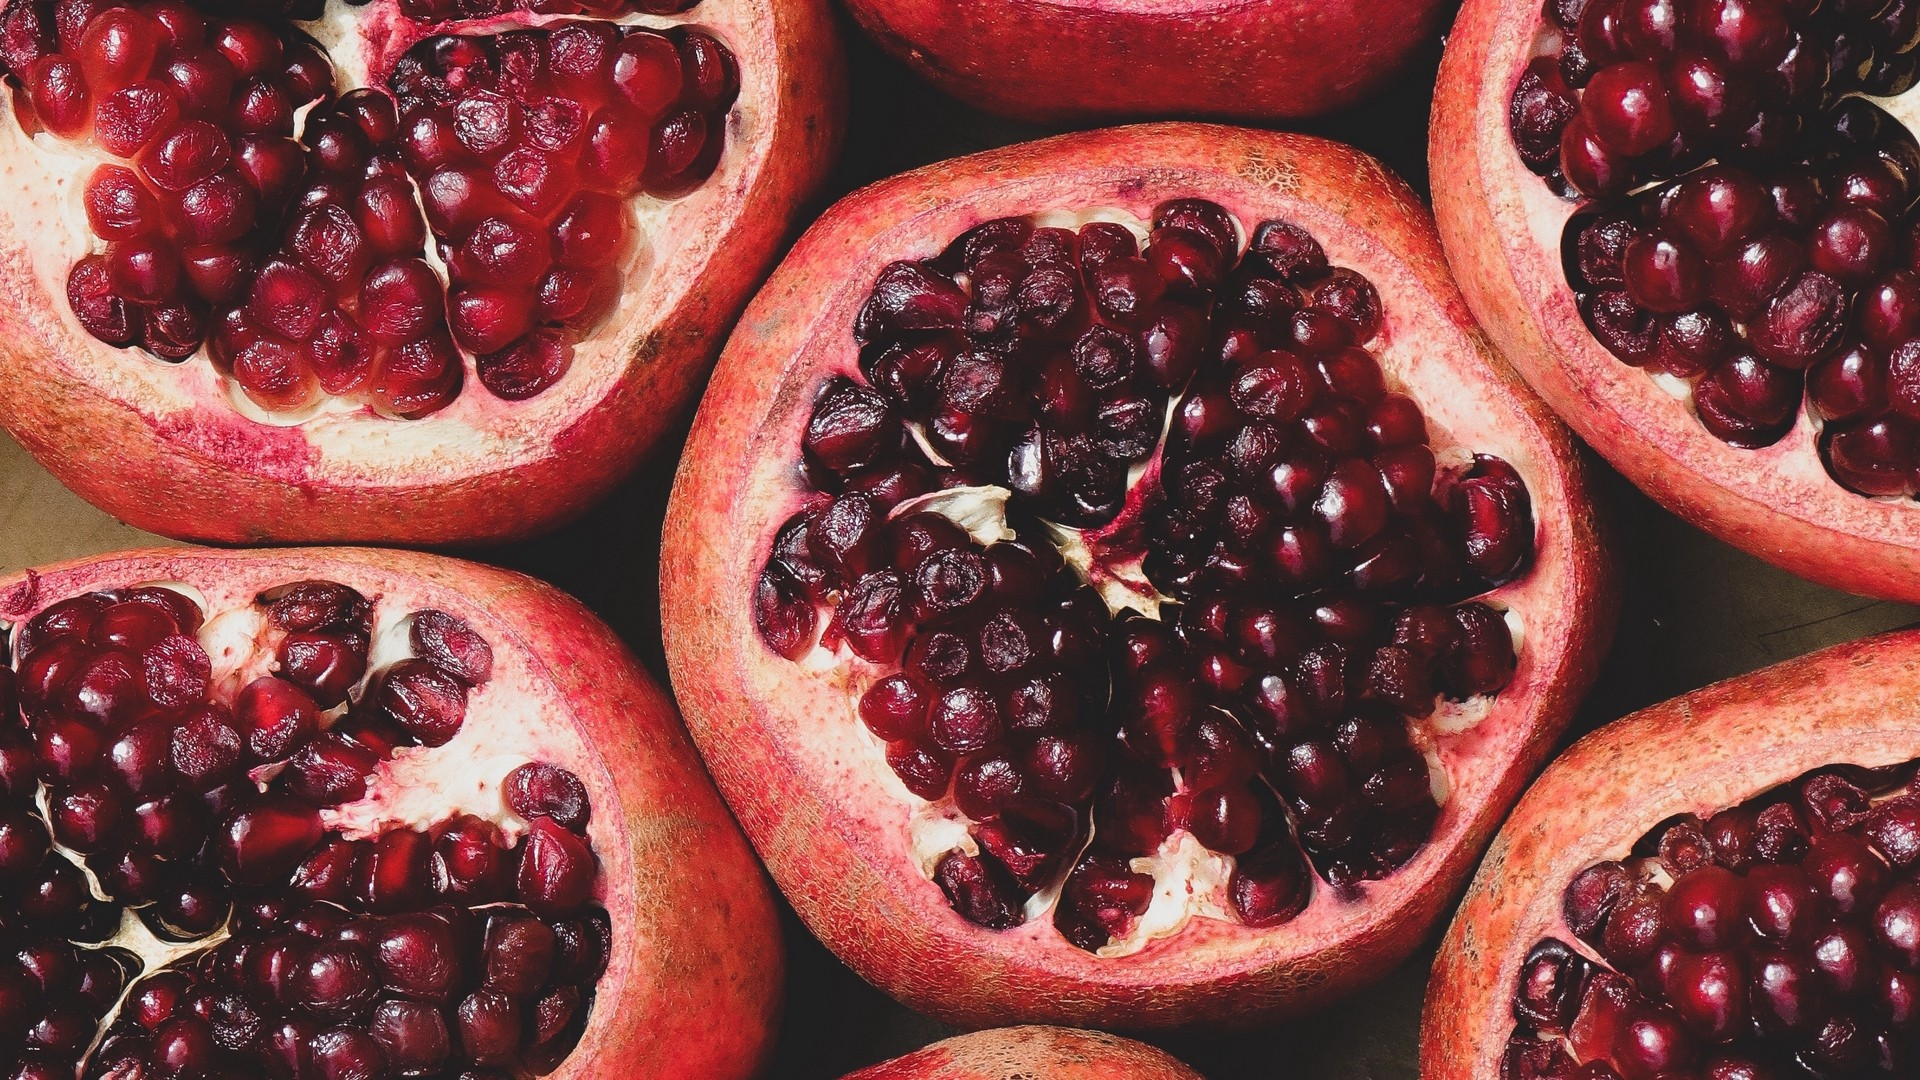 Pomegranate wallpaper photo hd